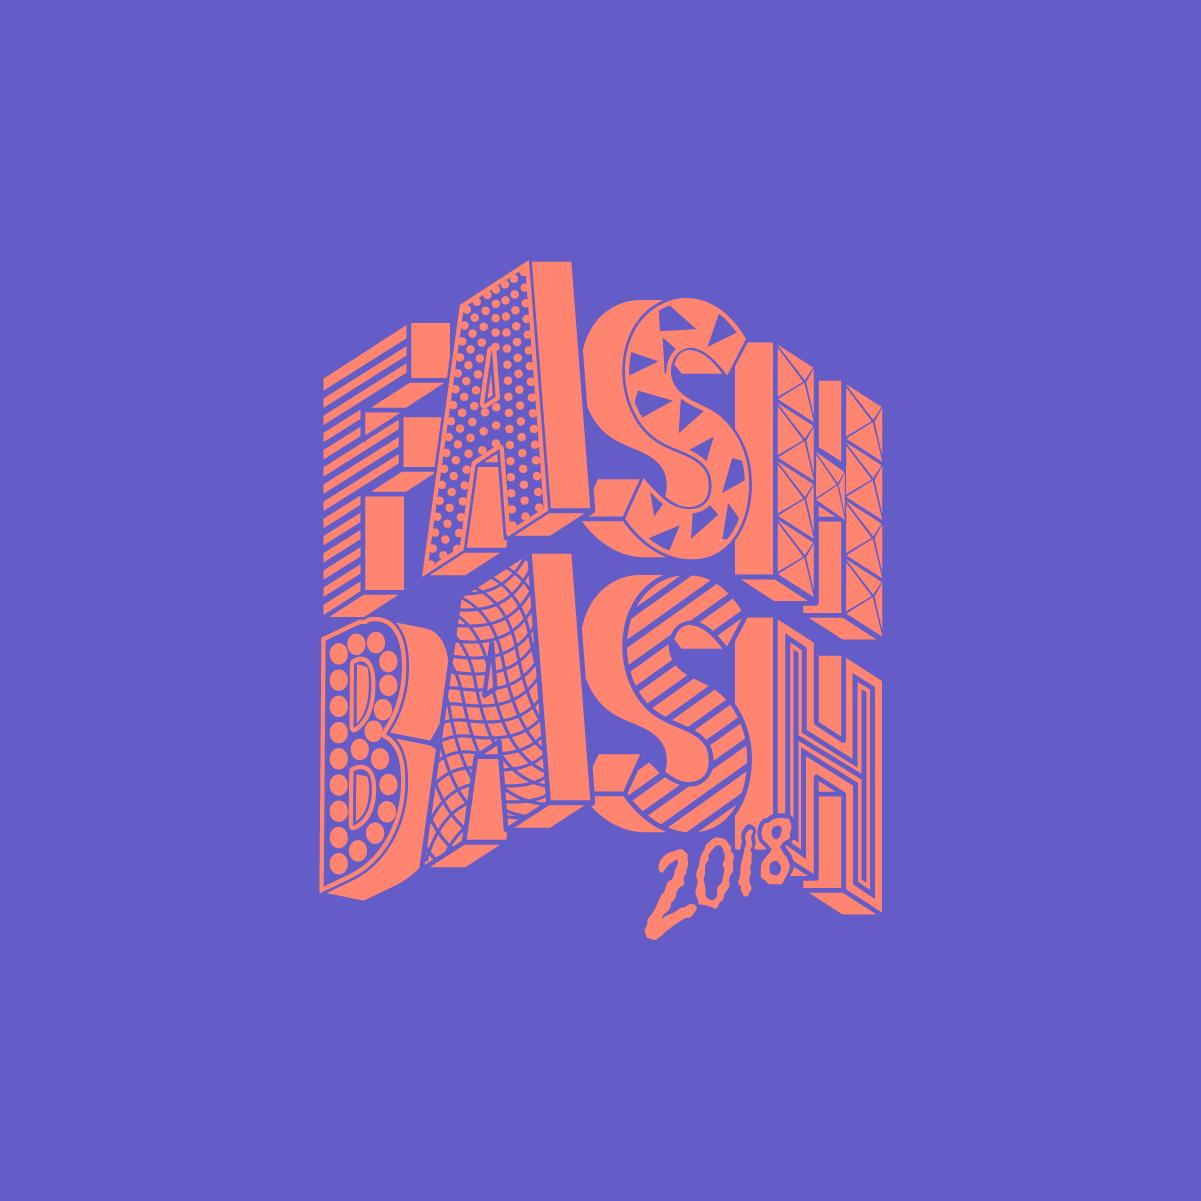 FashBash_headers_03-04